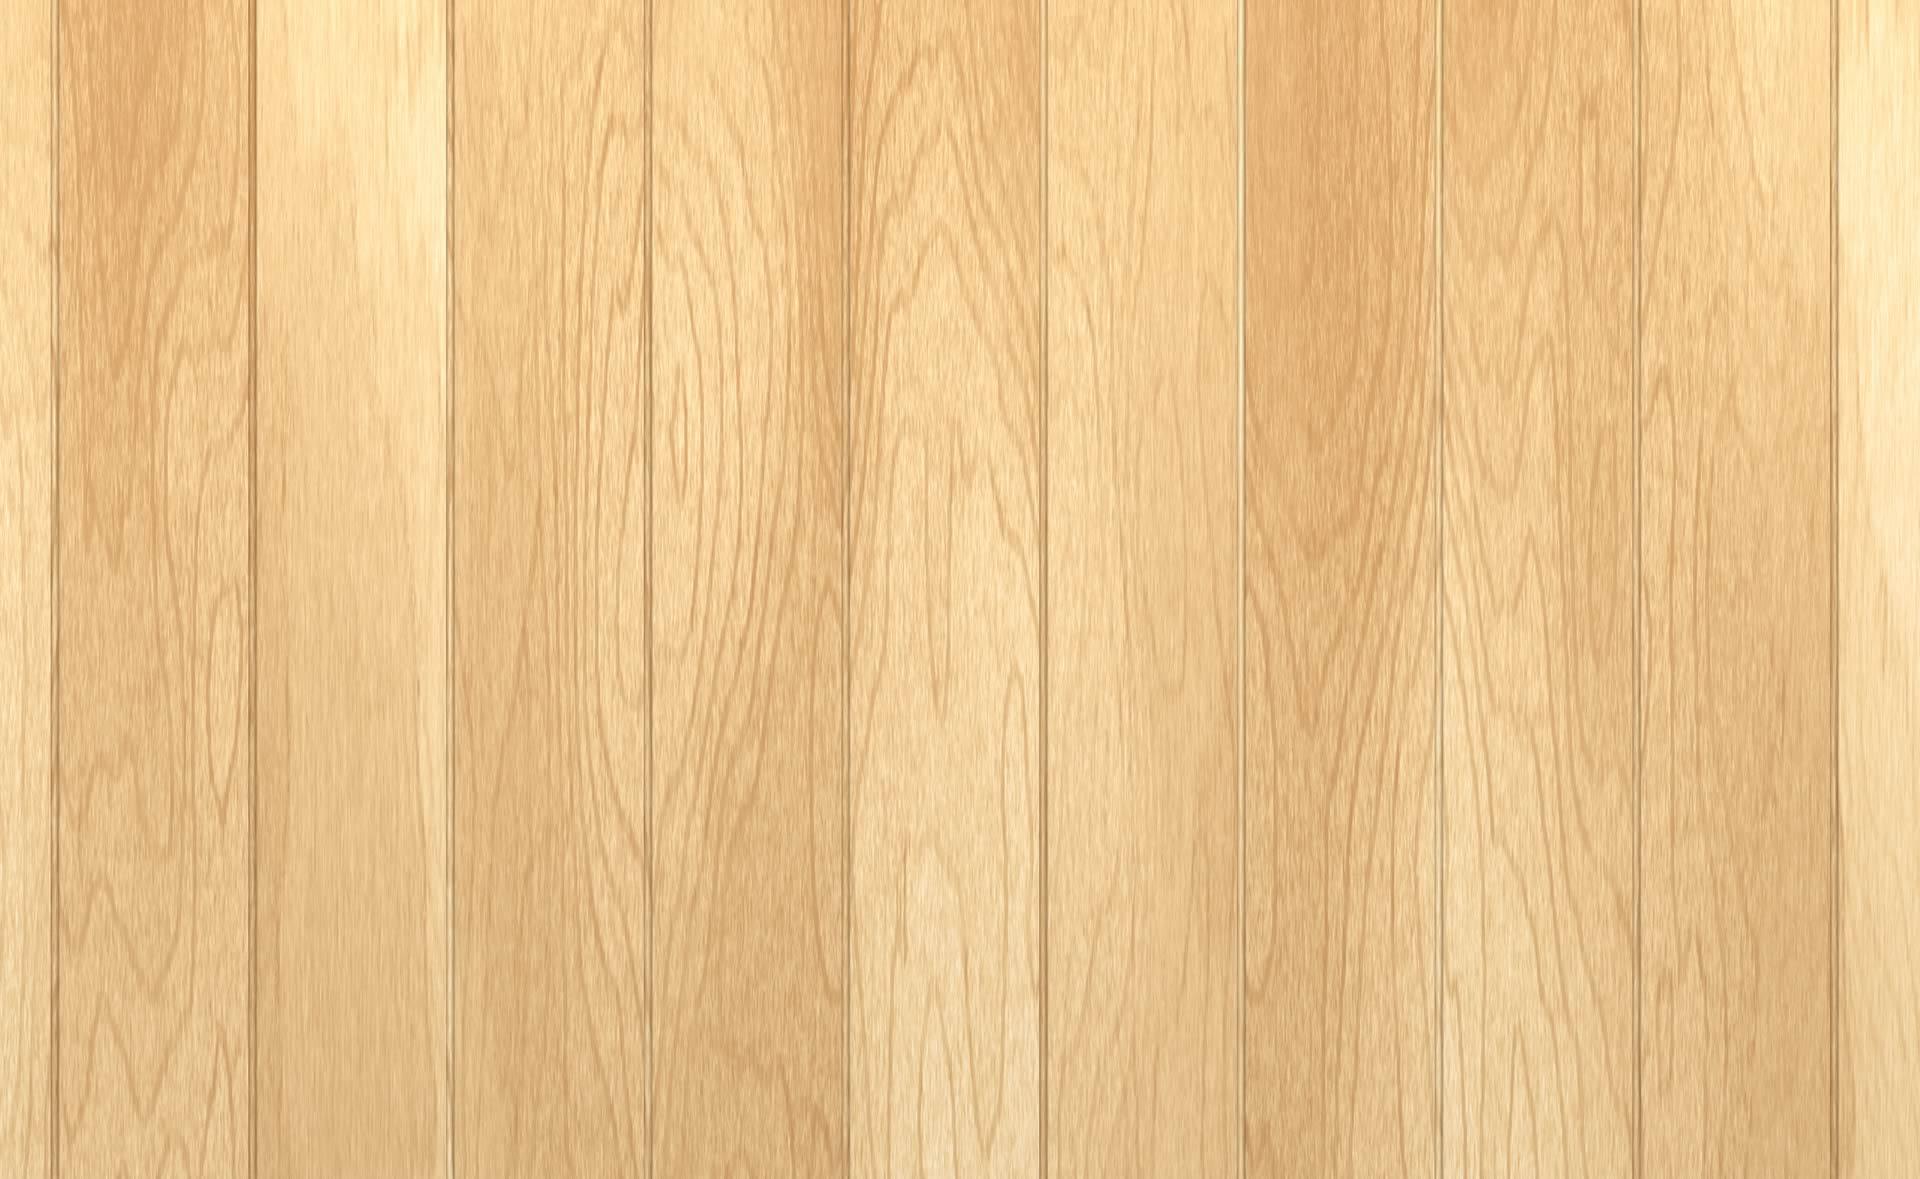 wooden-panels-texture2